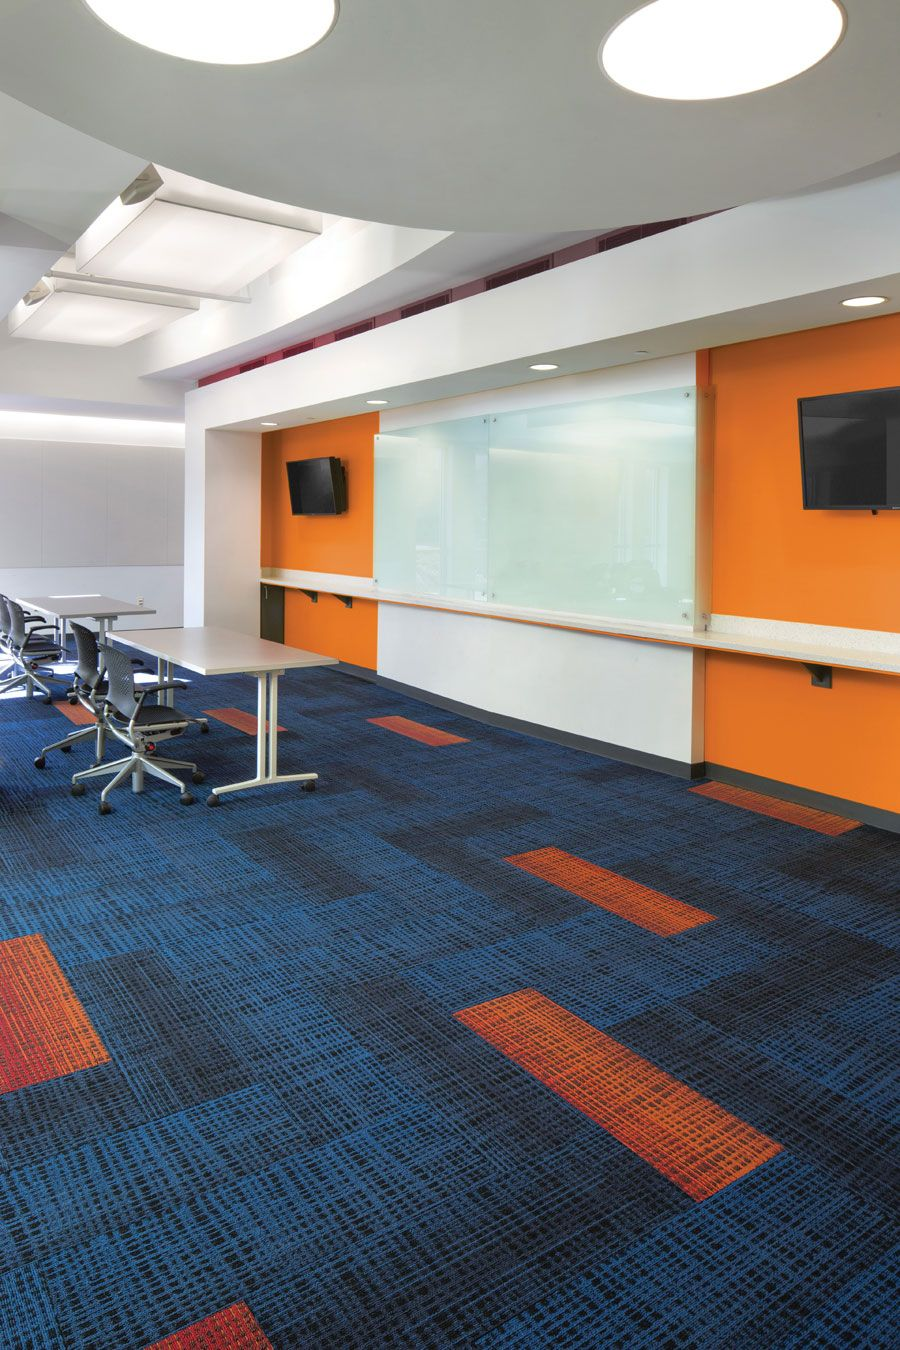 Kinesthetic Tile 12BY36, Lees Commercial Modular Carpet